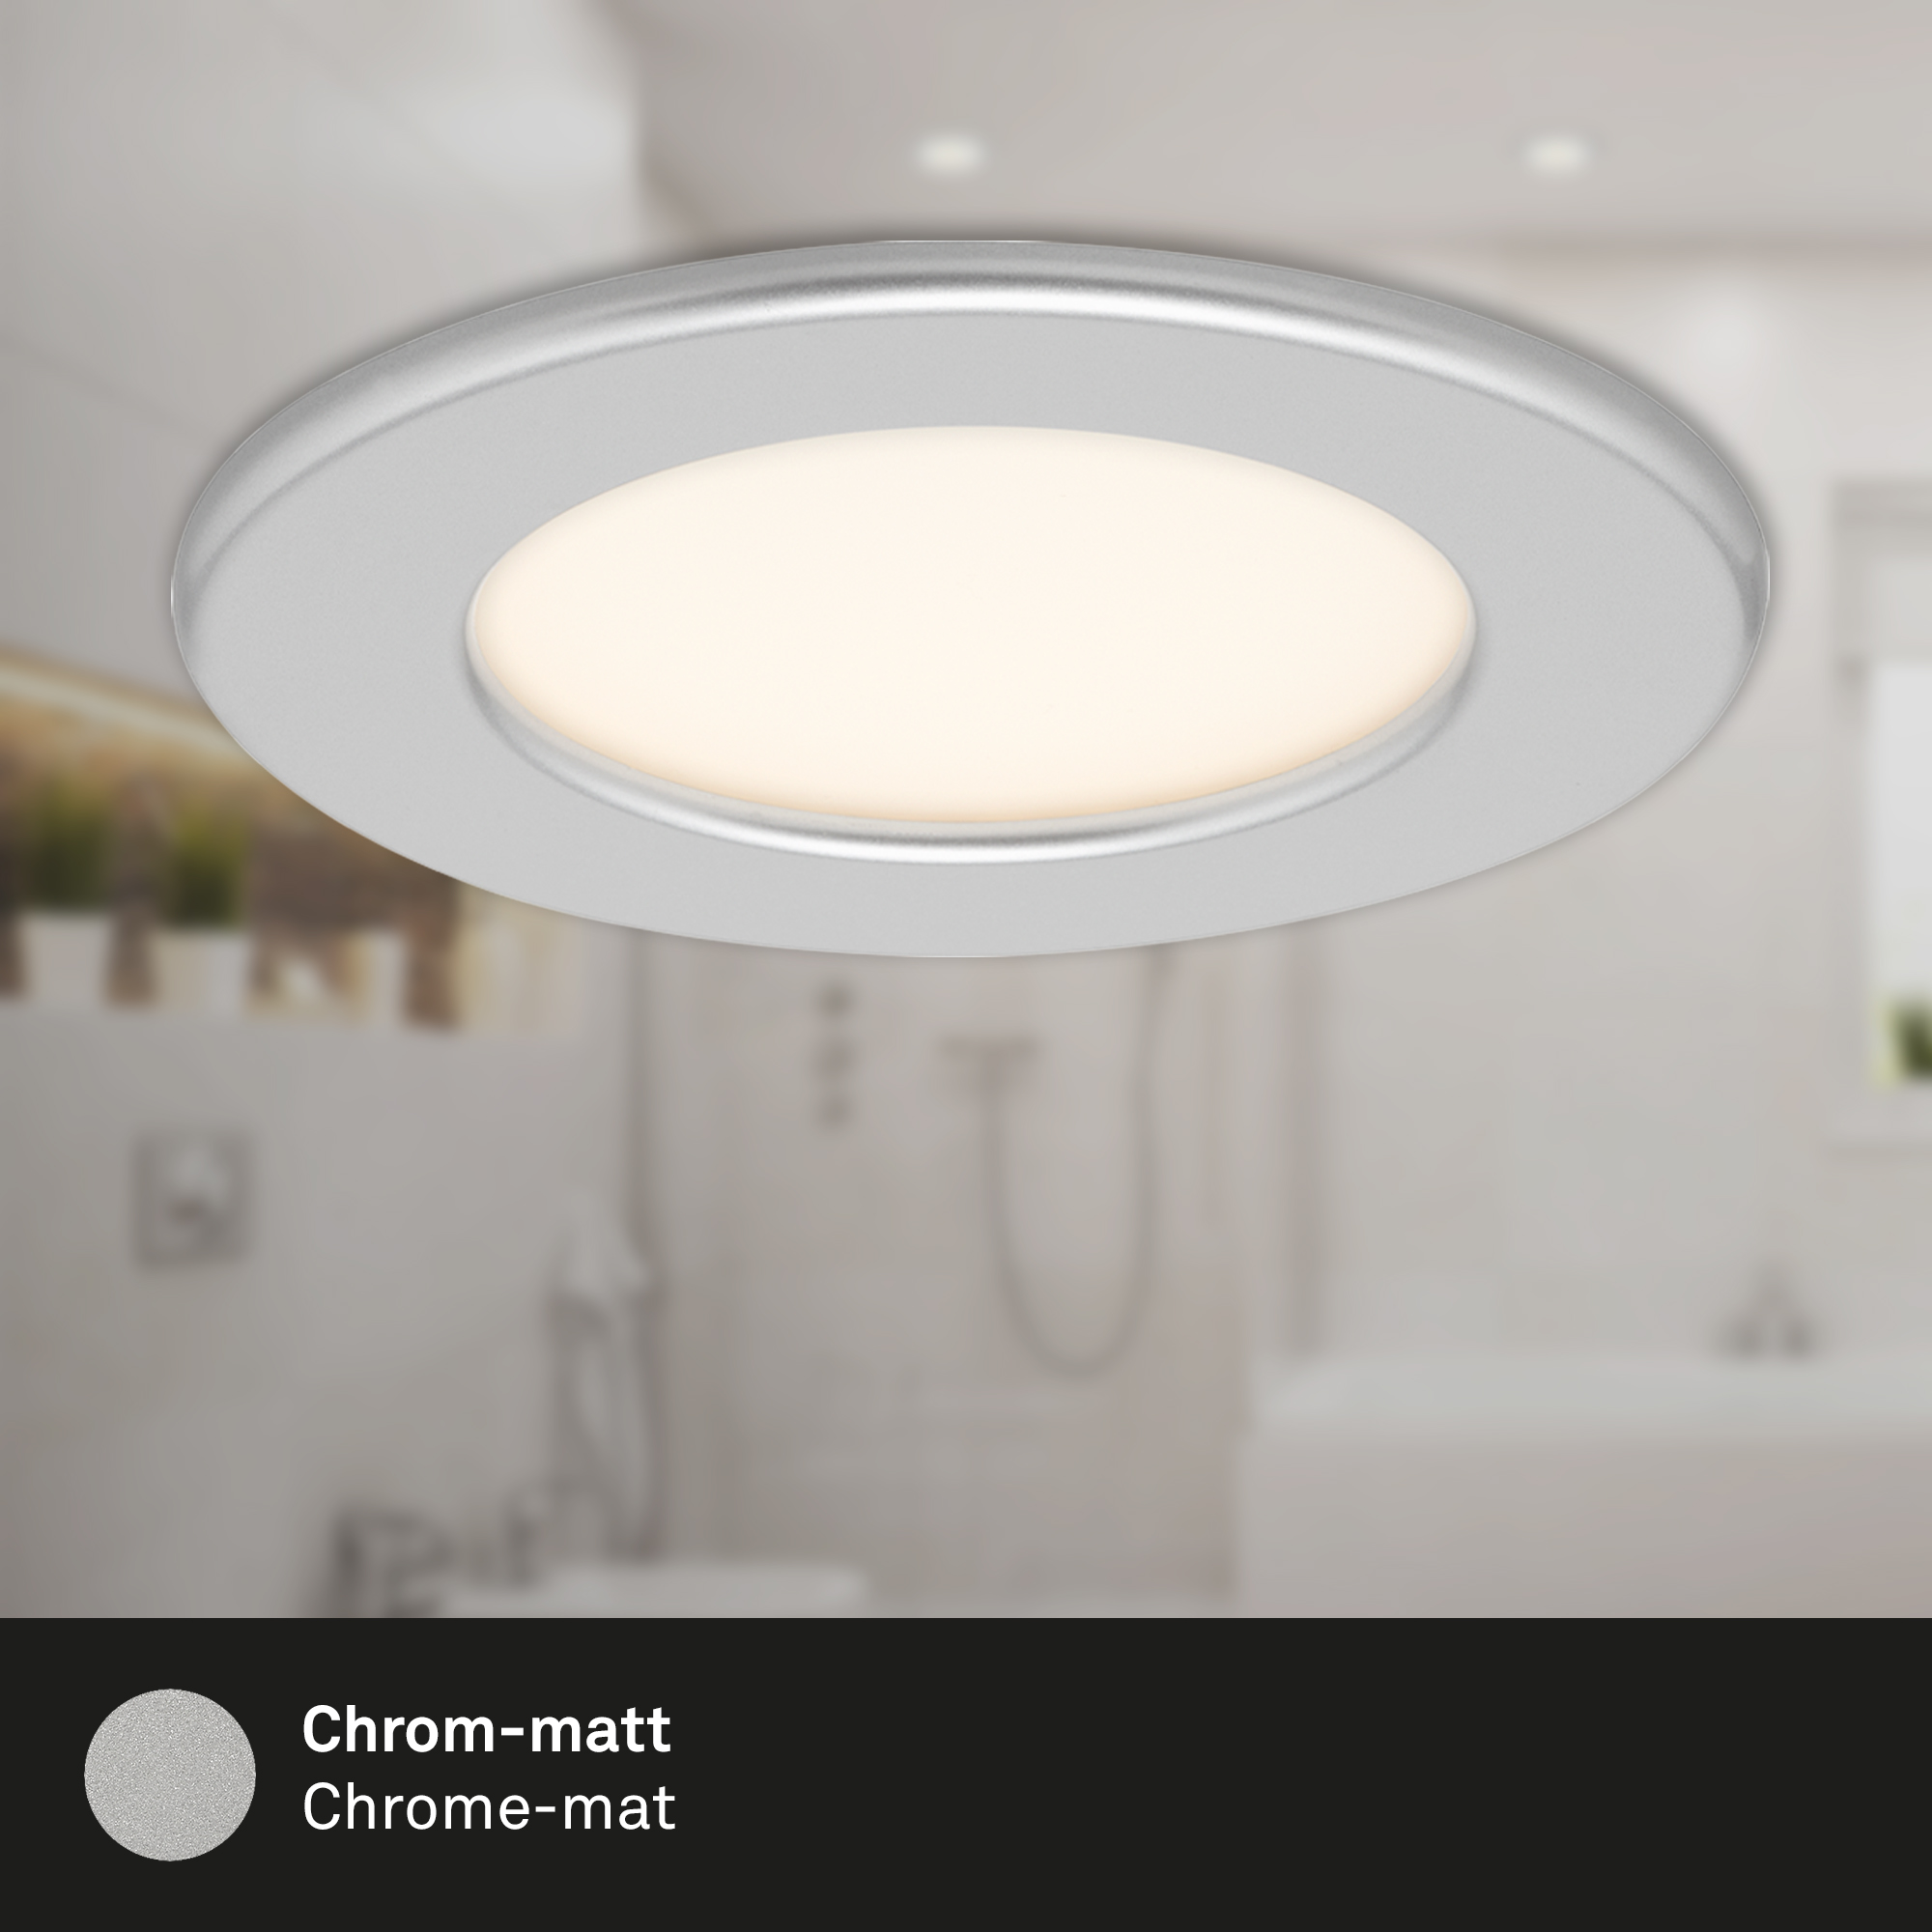 3er Set LED Einbauleuchte Chrom-Matt